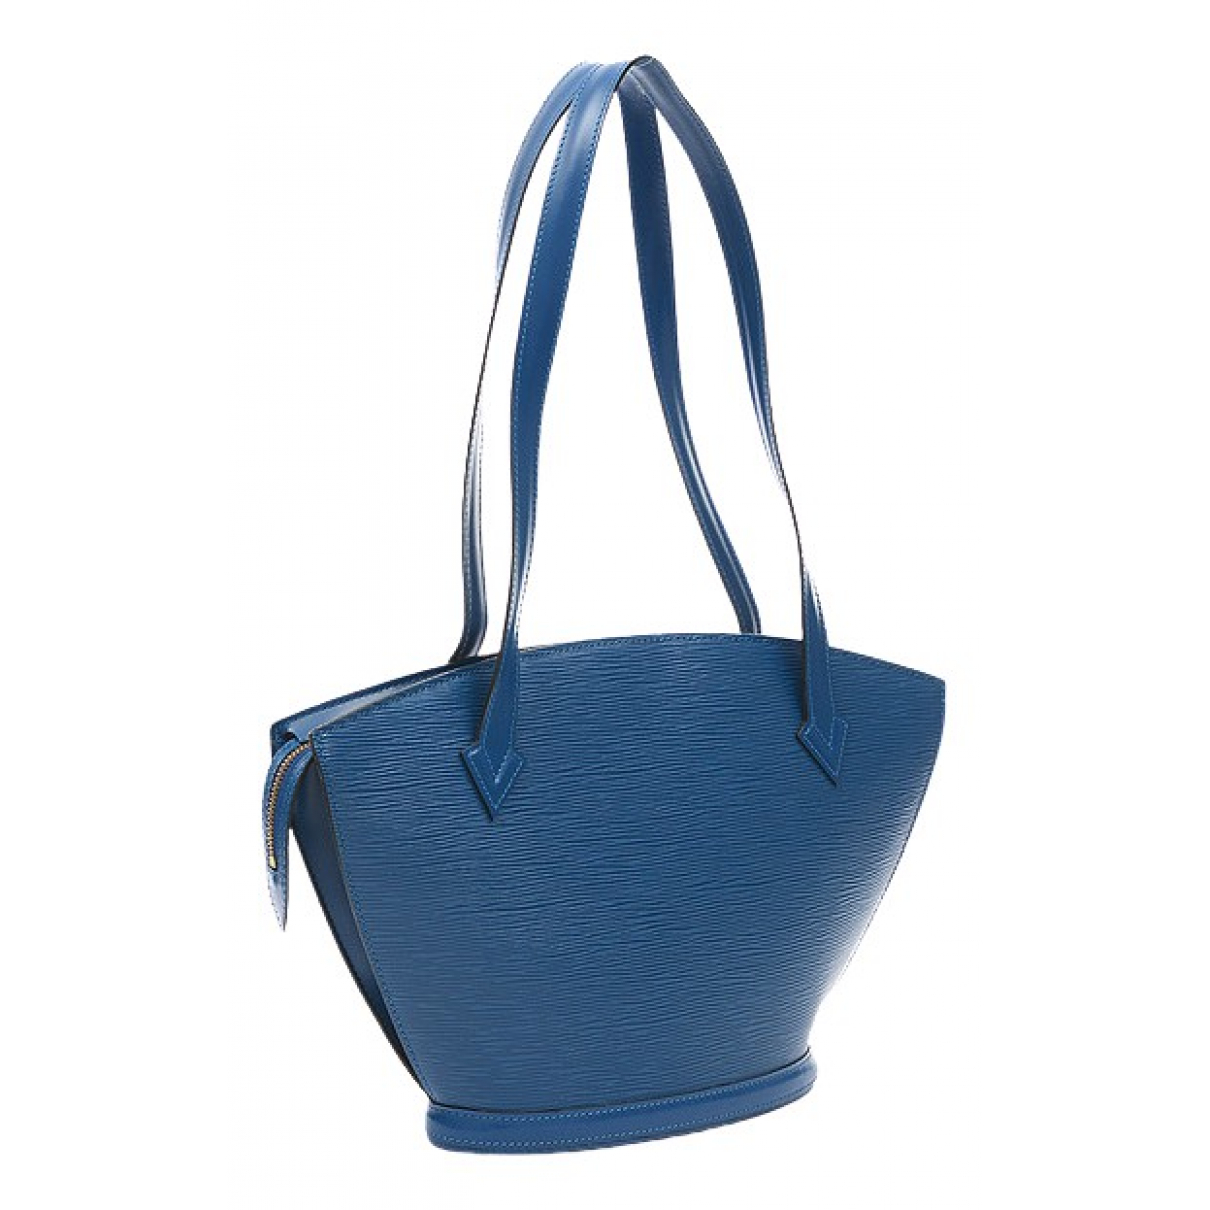 Louis Vuitton - Sac a main   pour femme en cuir - bleu